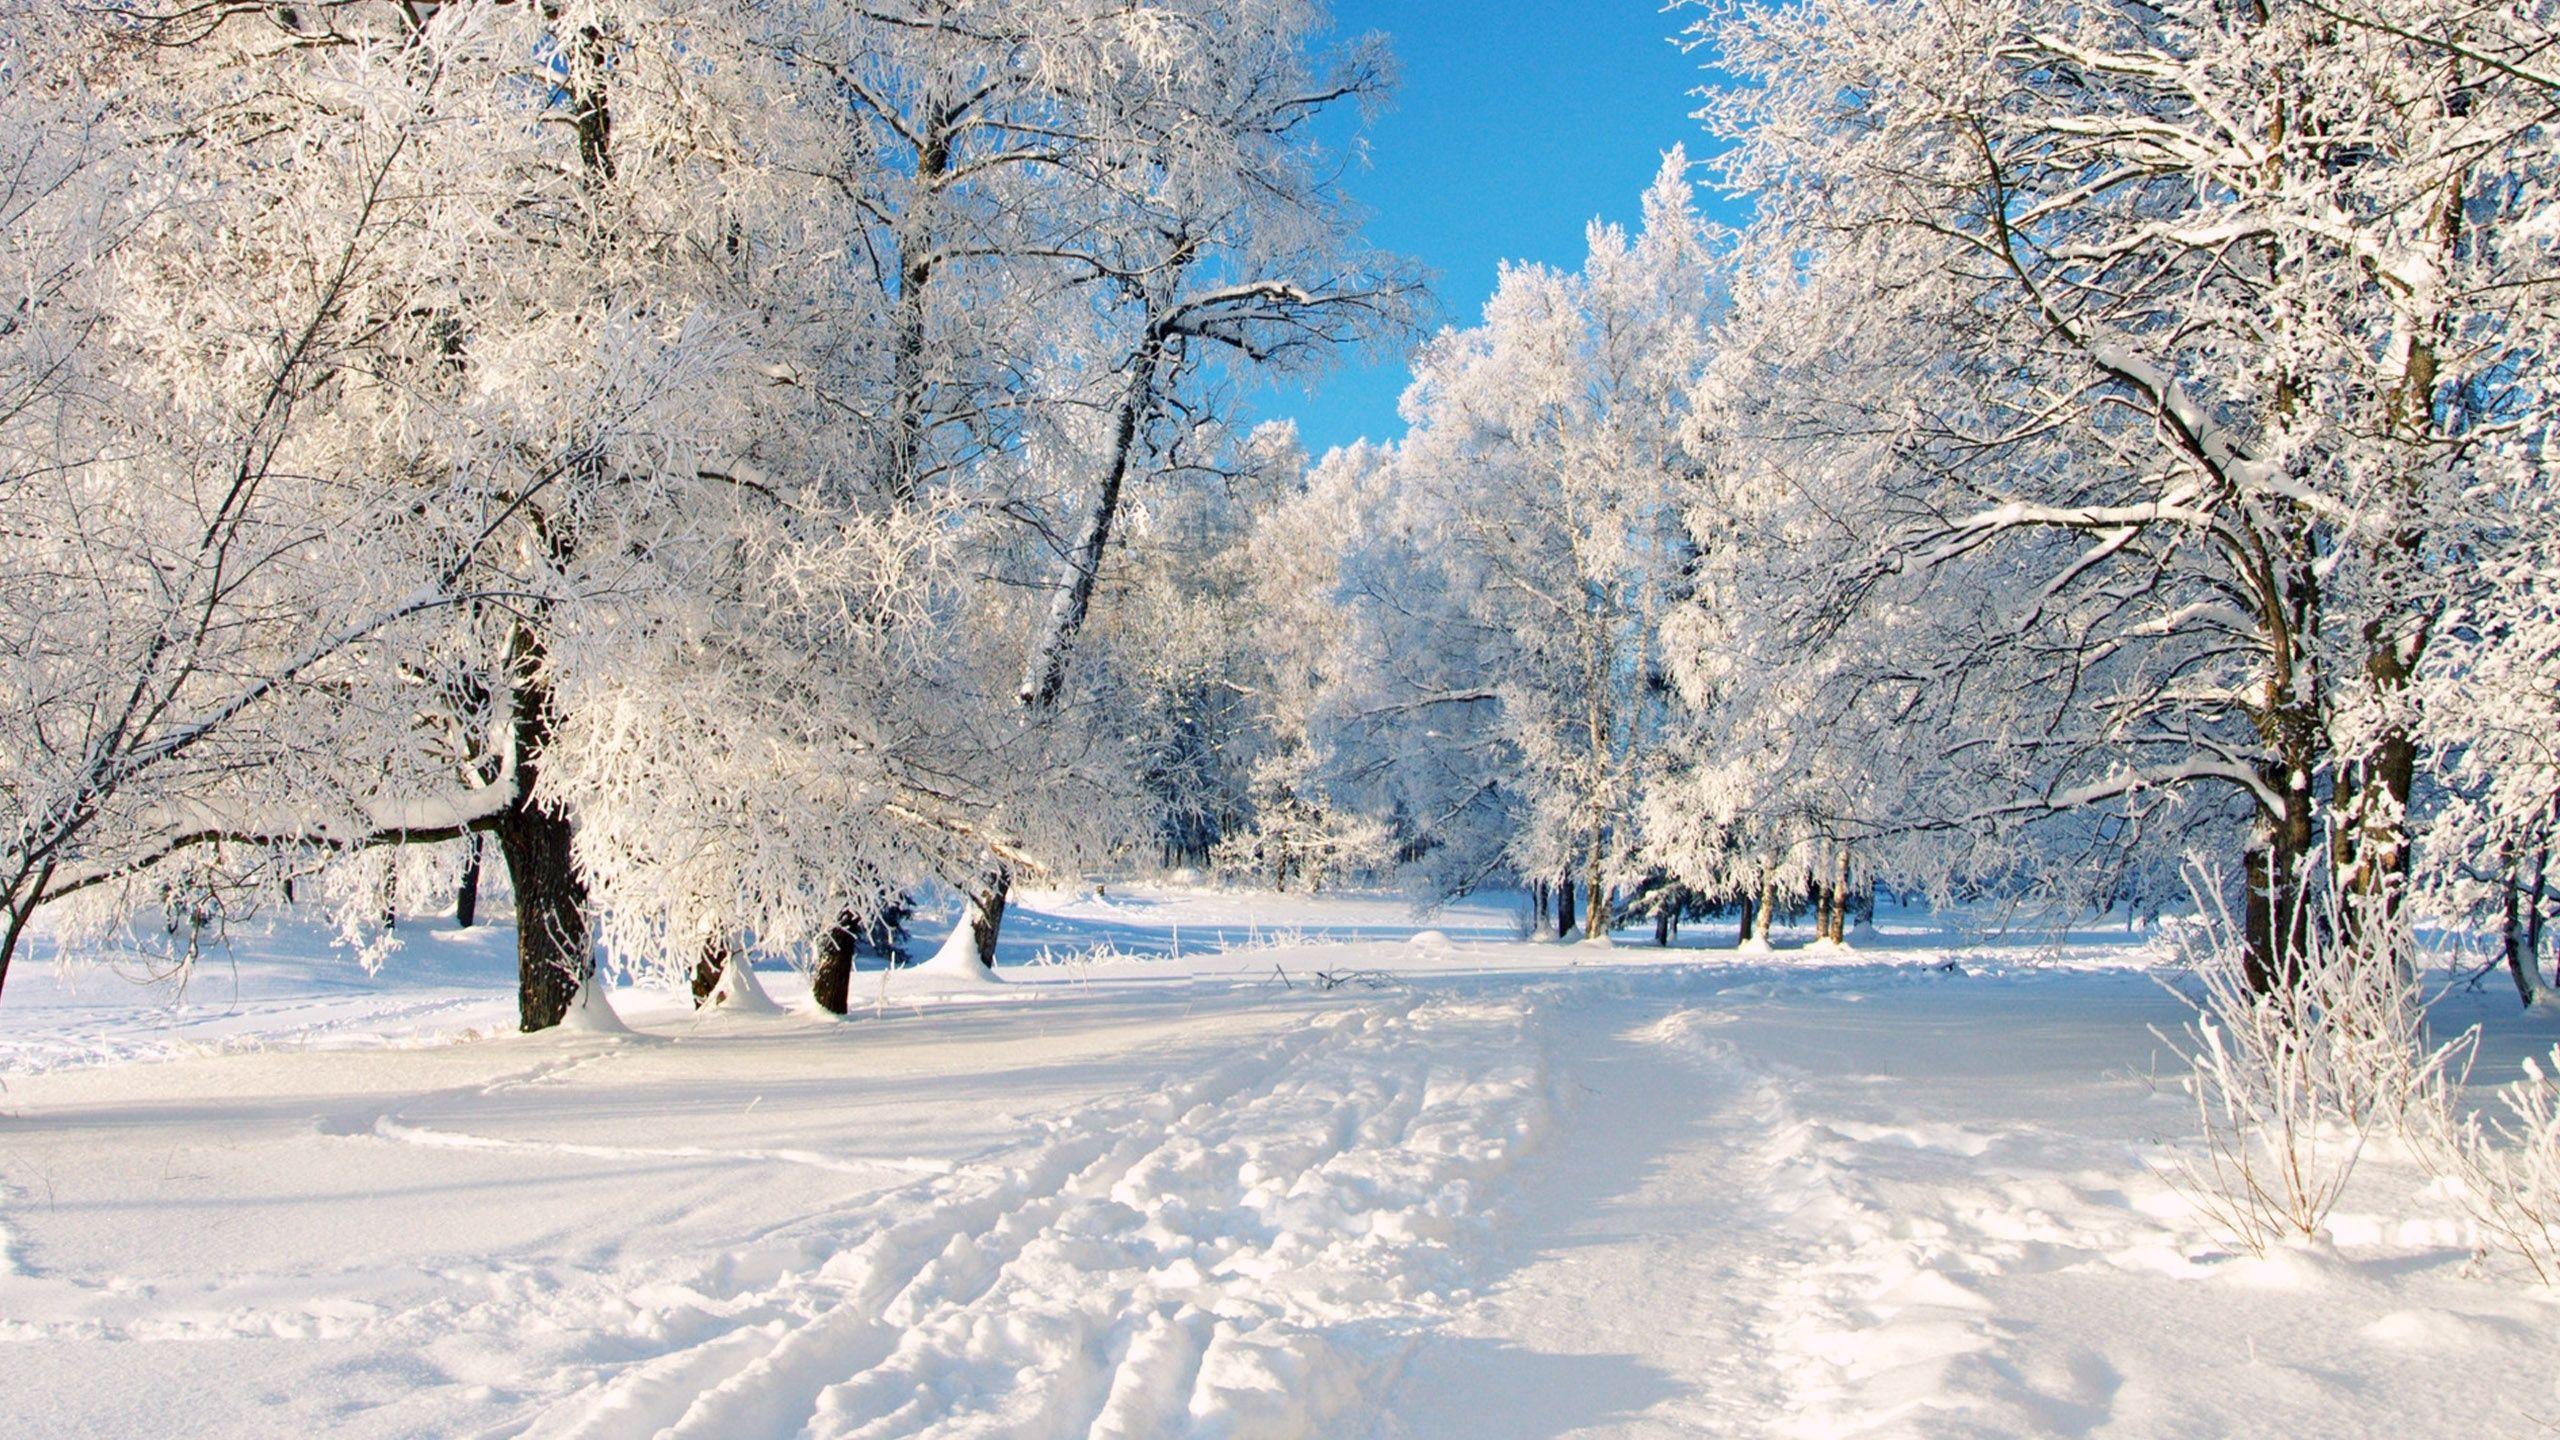 2560x1440 A Dreamy Winter Scenery Desktop Wallpapers And Stock Photos Winter Desktop Background Winter Scenery Winter Wallpaper Desktop